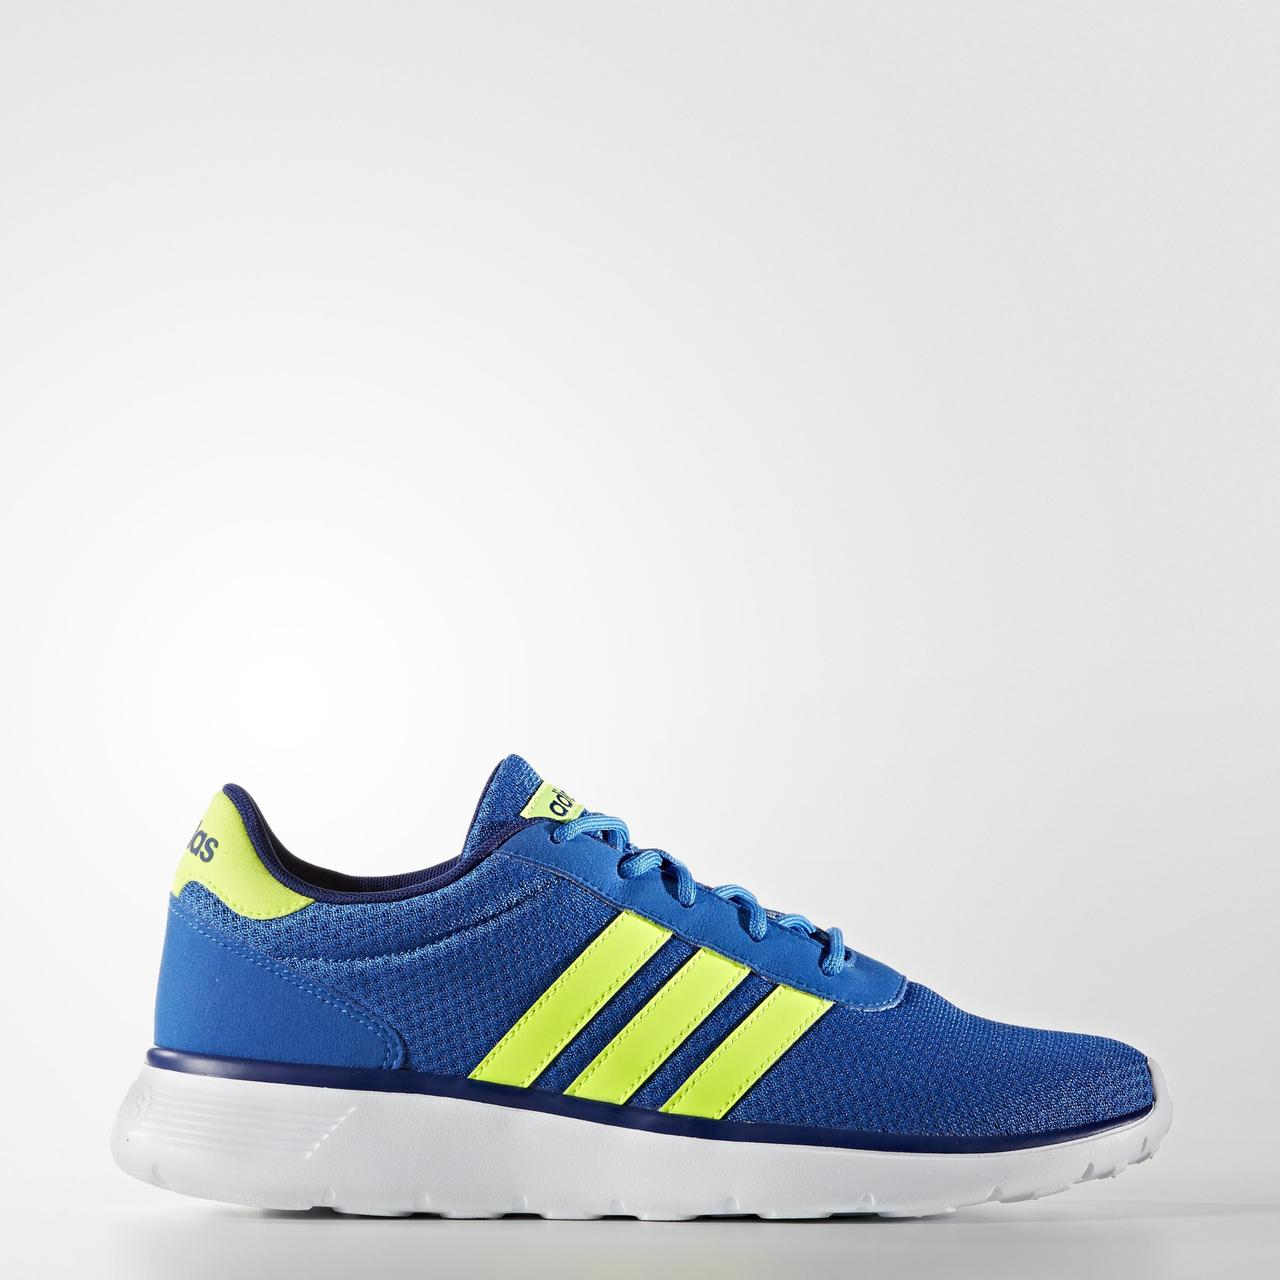 6cb756f87800 Мужские Кроссовки Adidas Lite Racer Shoes AW5049  продажа, цена в ...